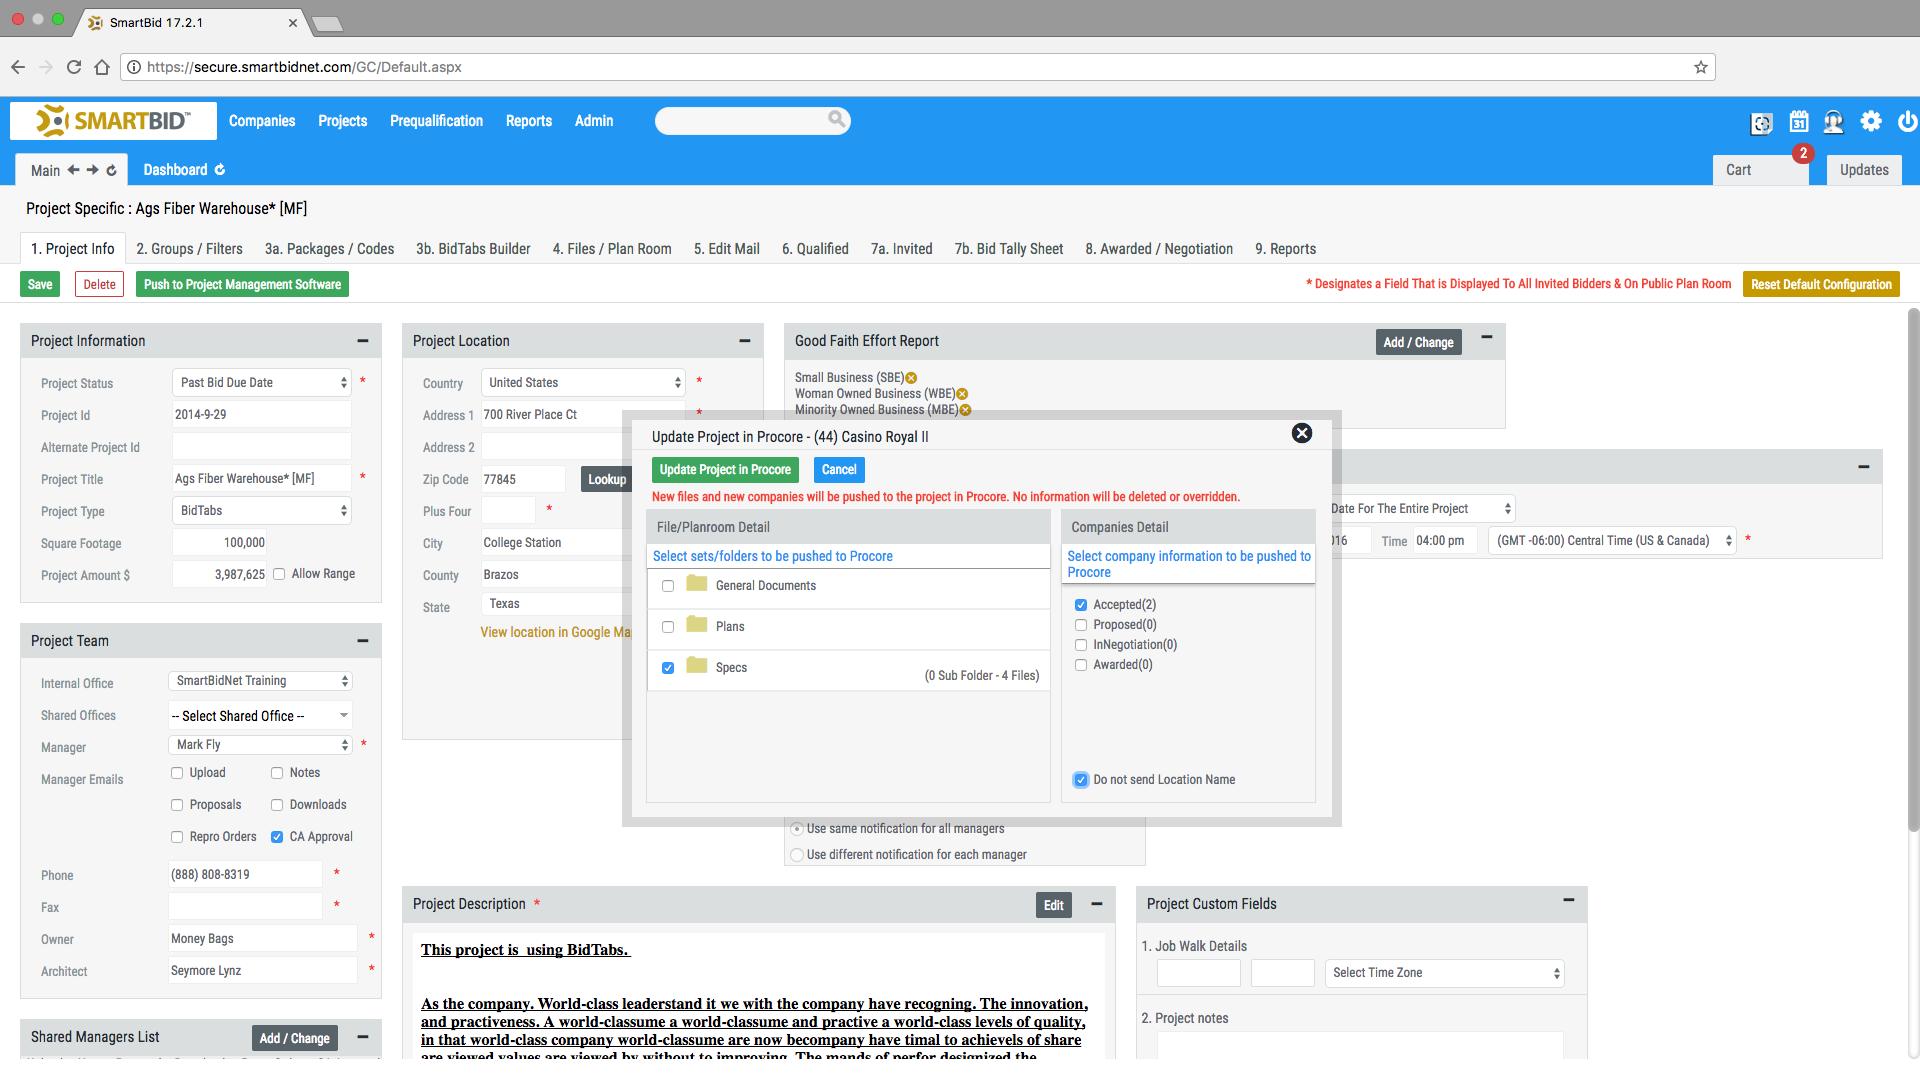 Sb screenshot procore integration 03